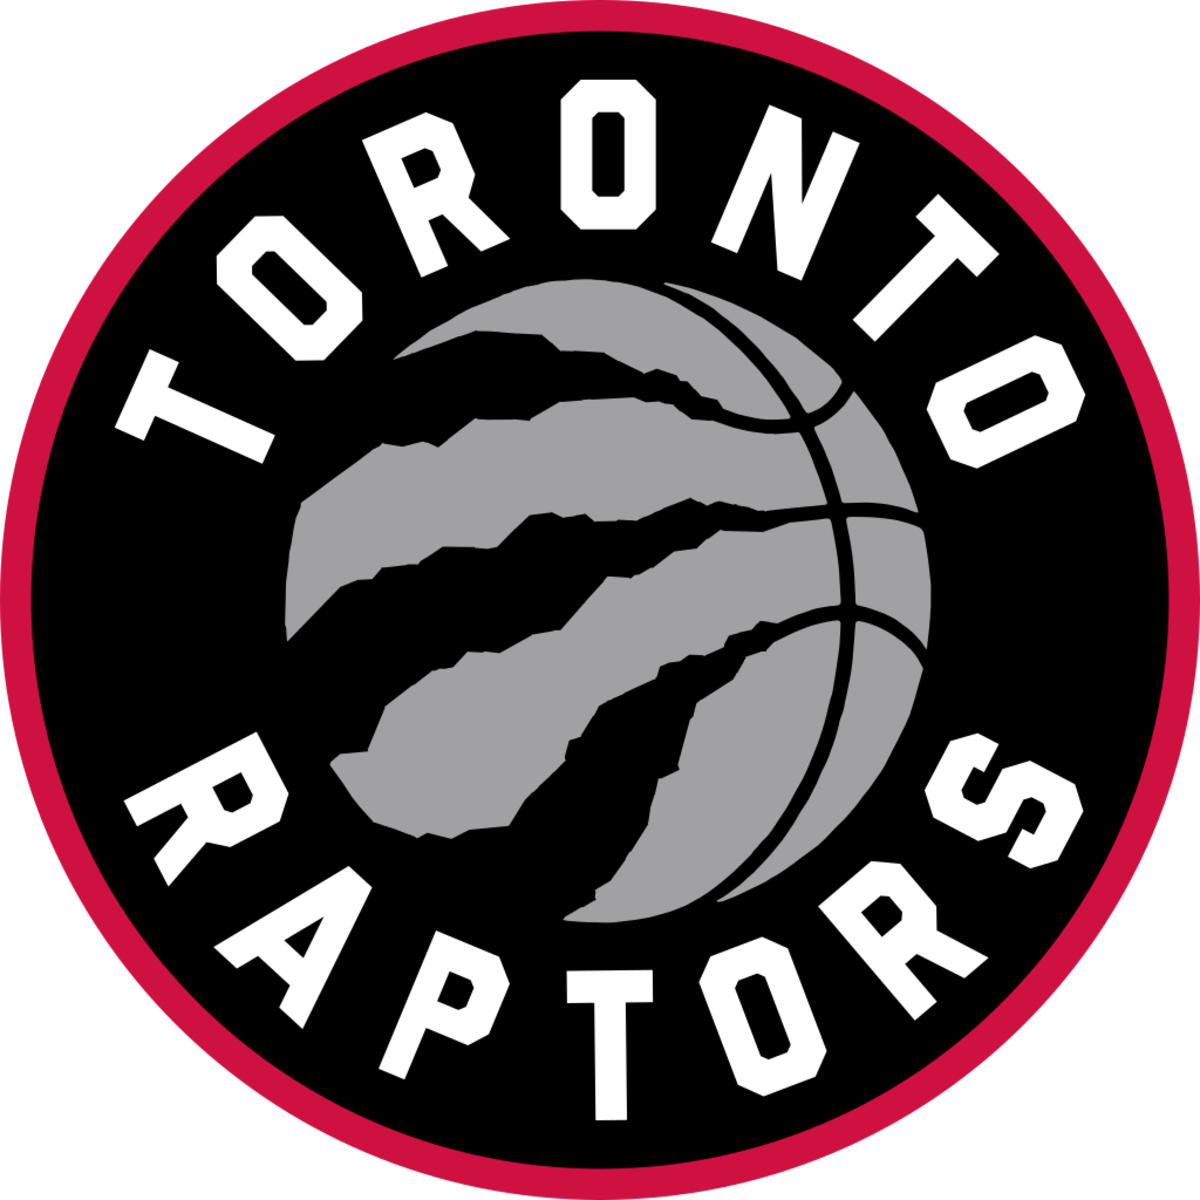 Toronto_Raptors_logo.svg